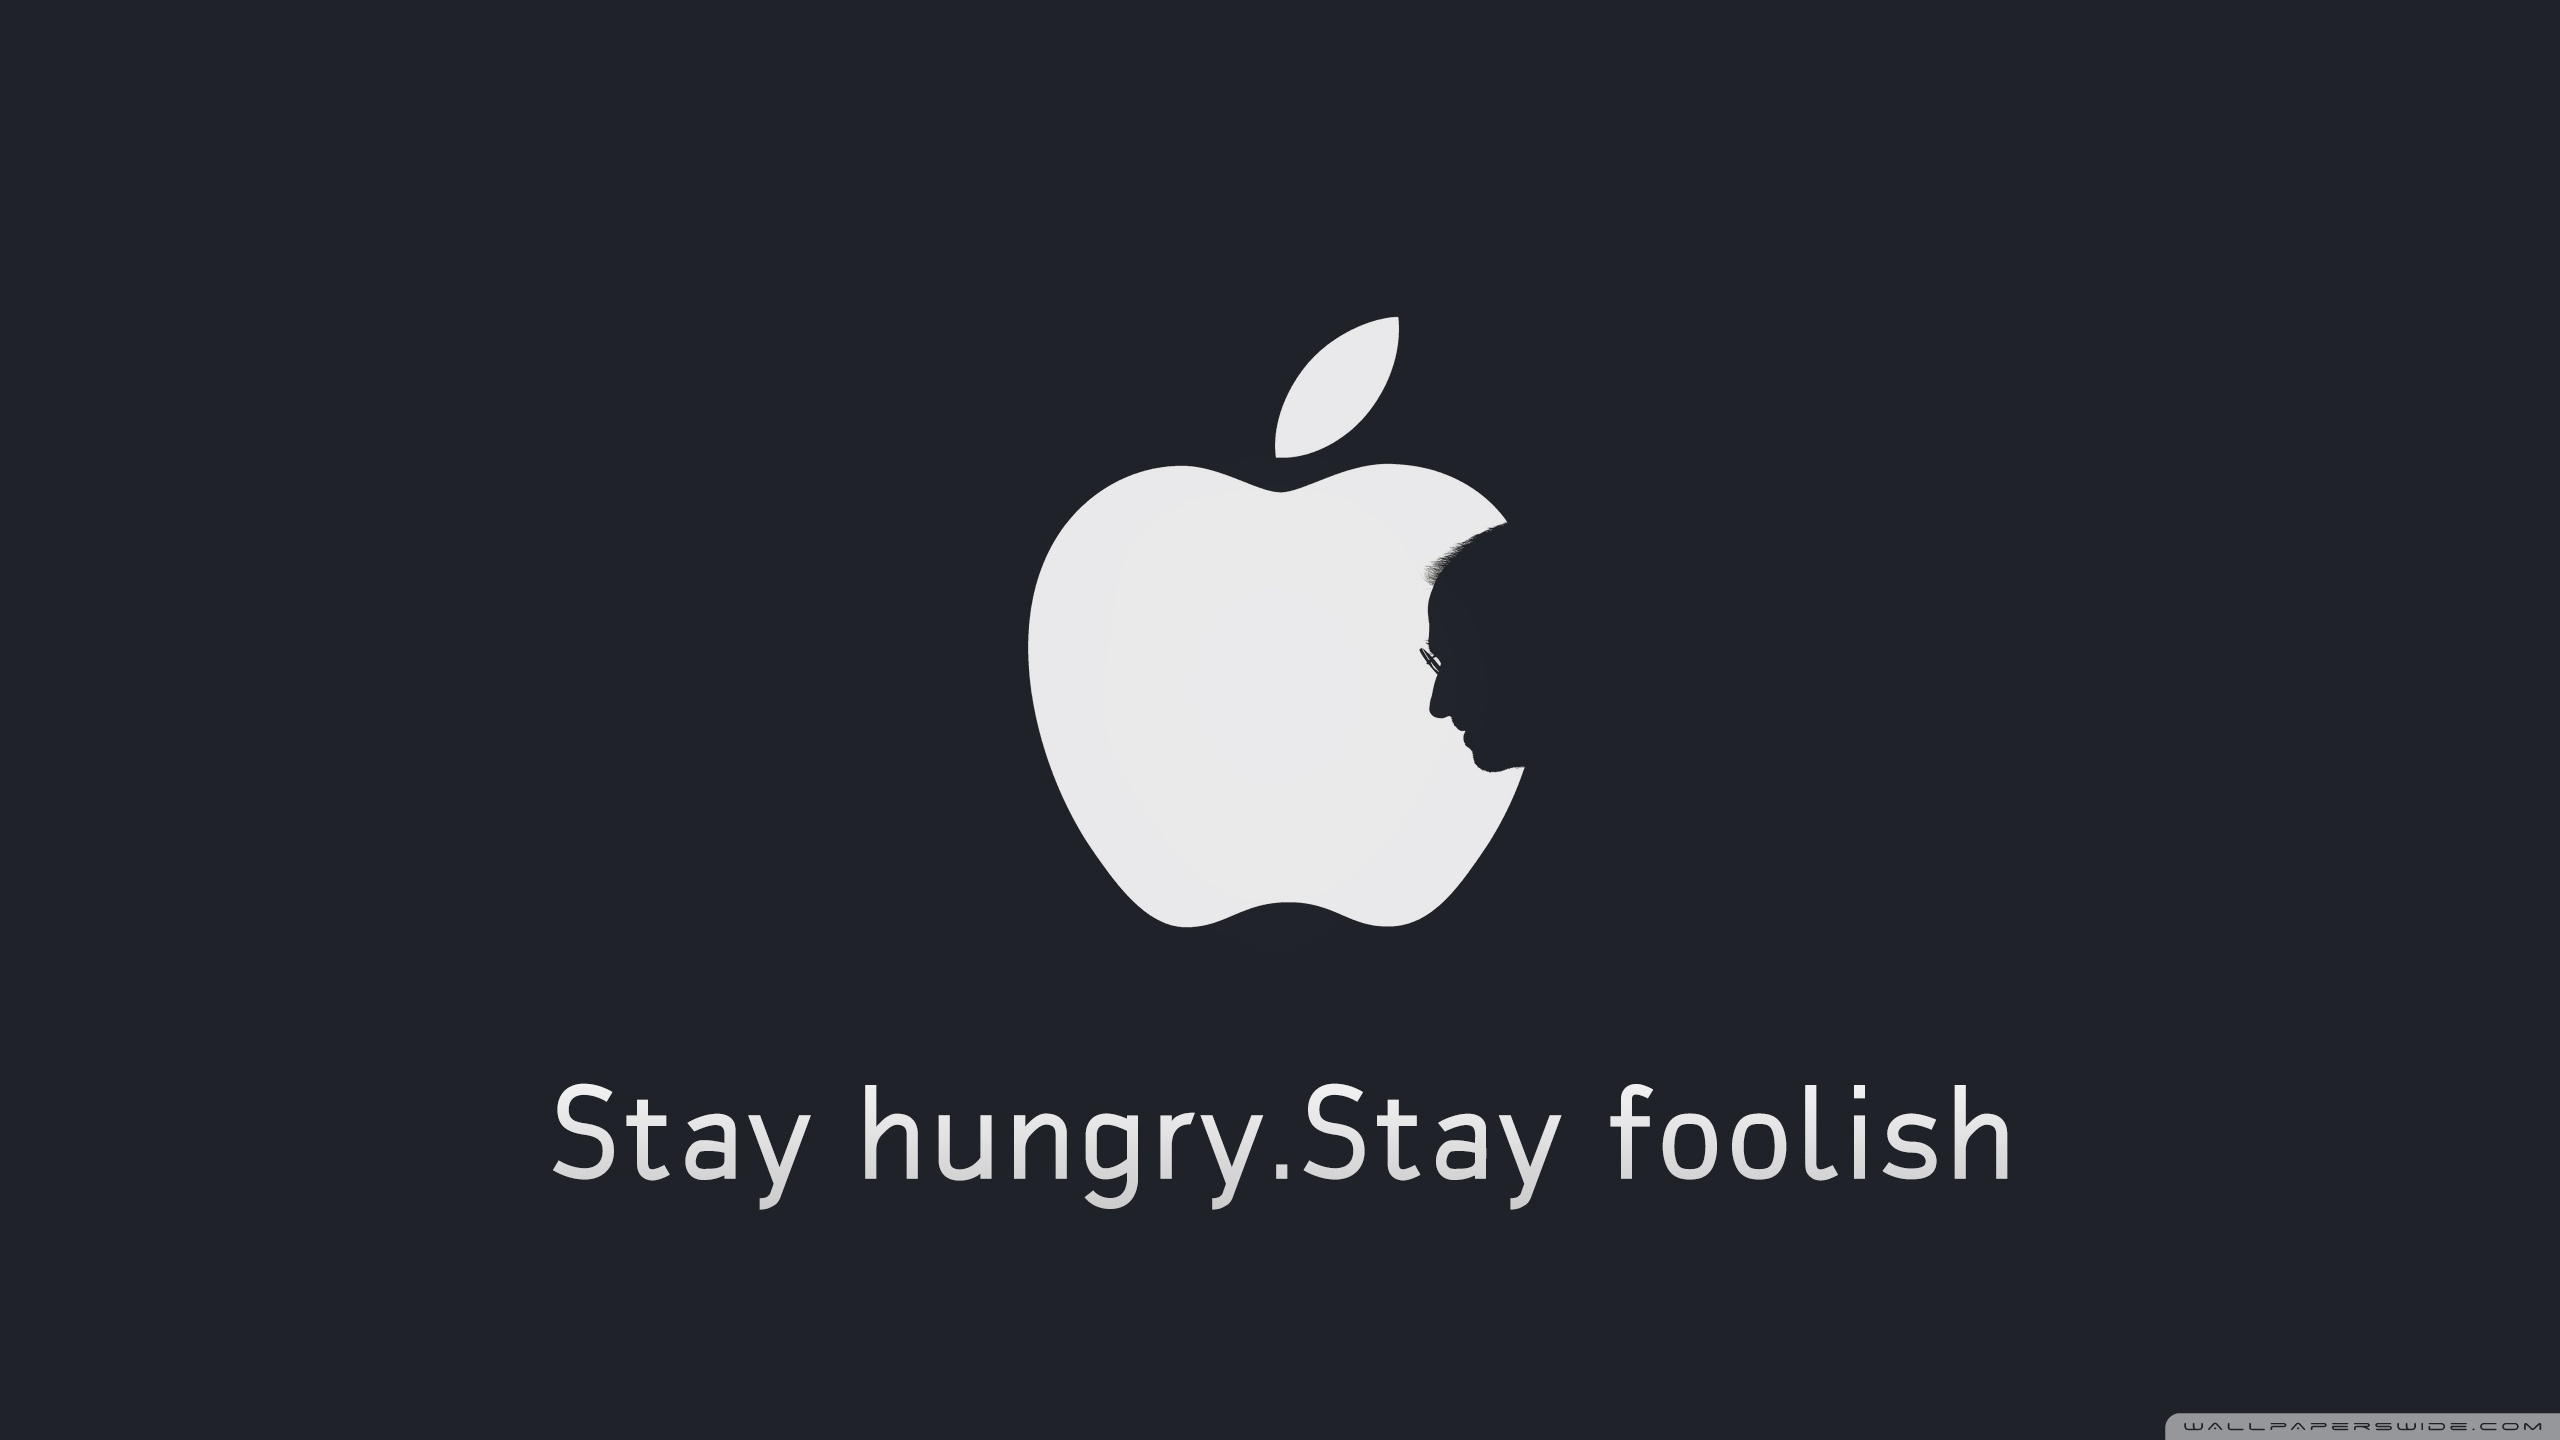 Apple Steve Jobs Memories Wallpaper 2560x1440 Anhim